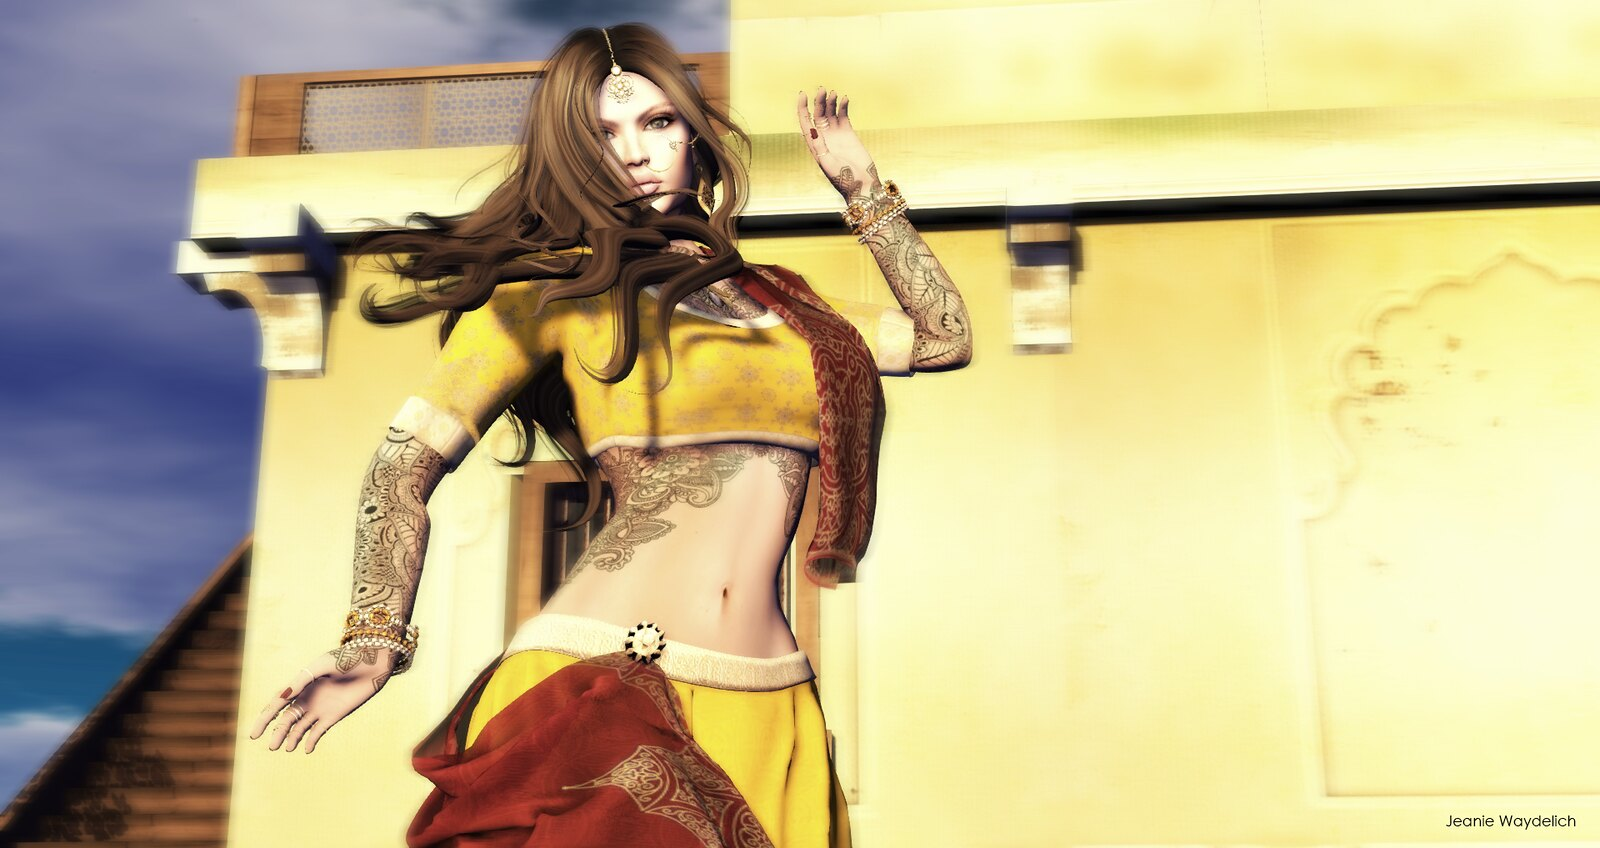 LOTD 873 - Dance *-*